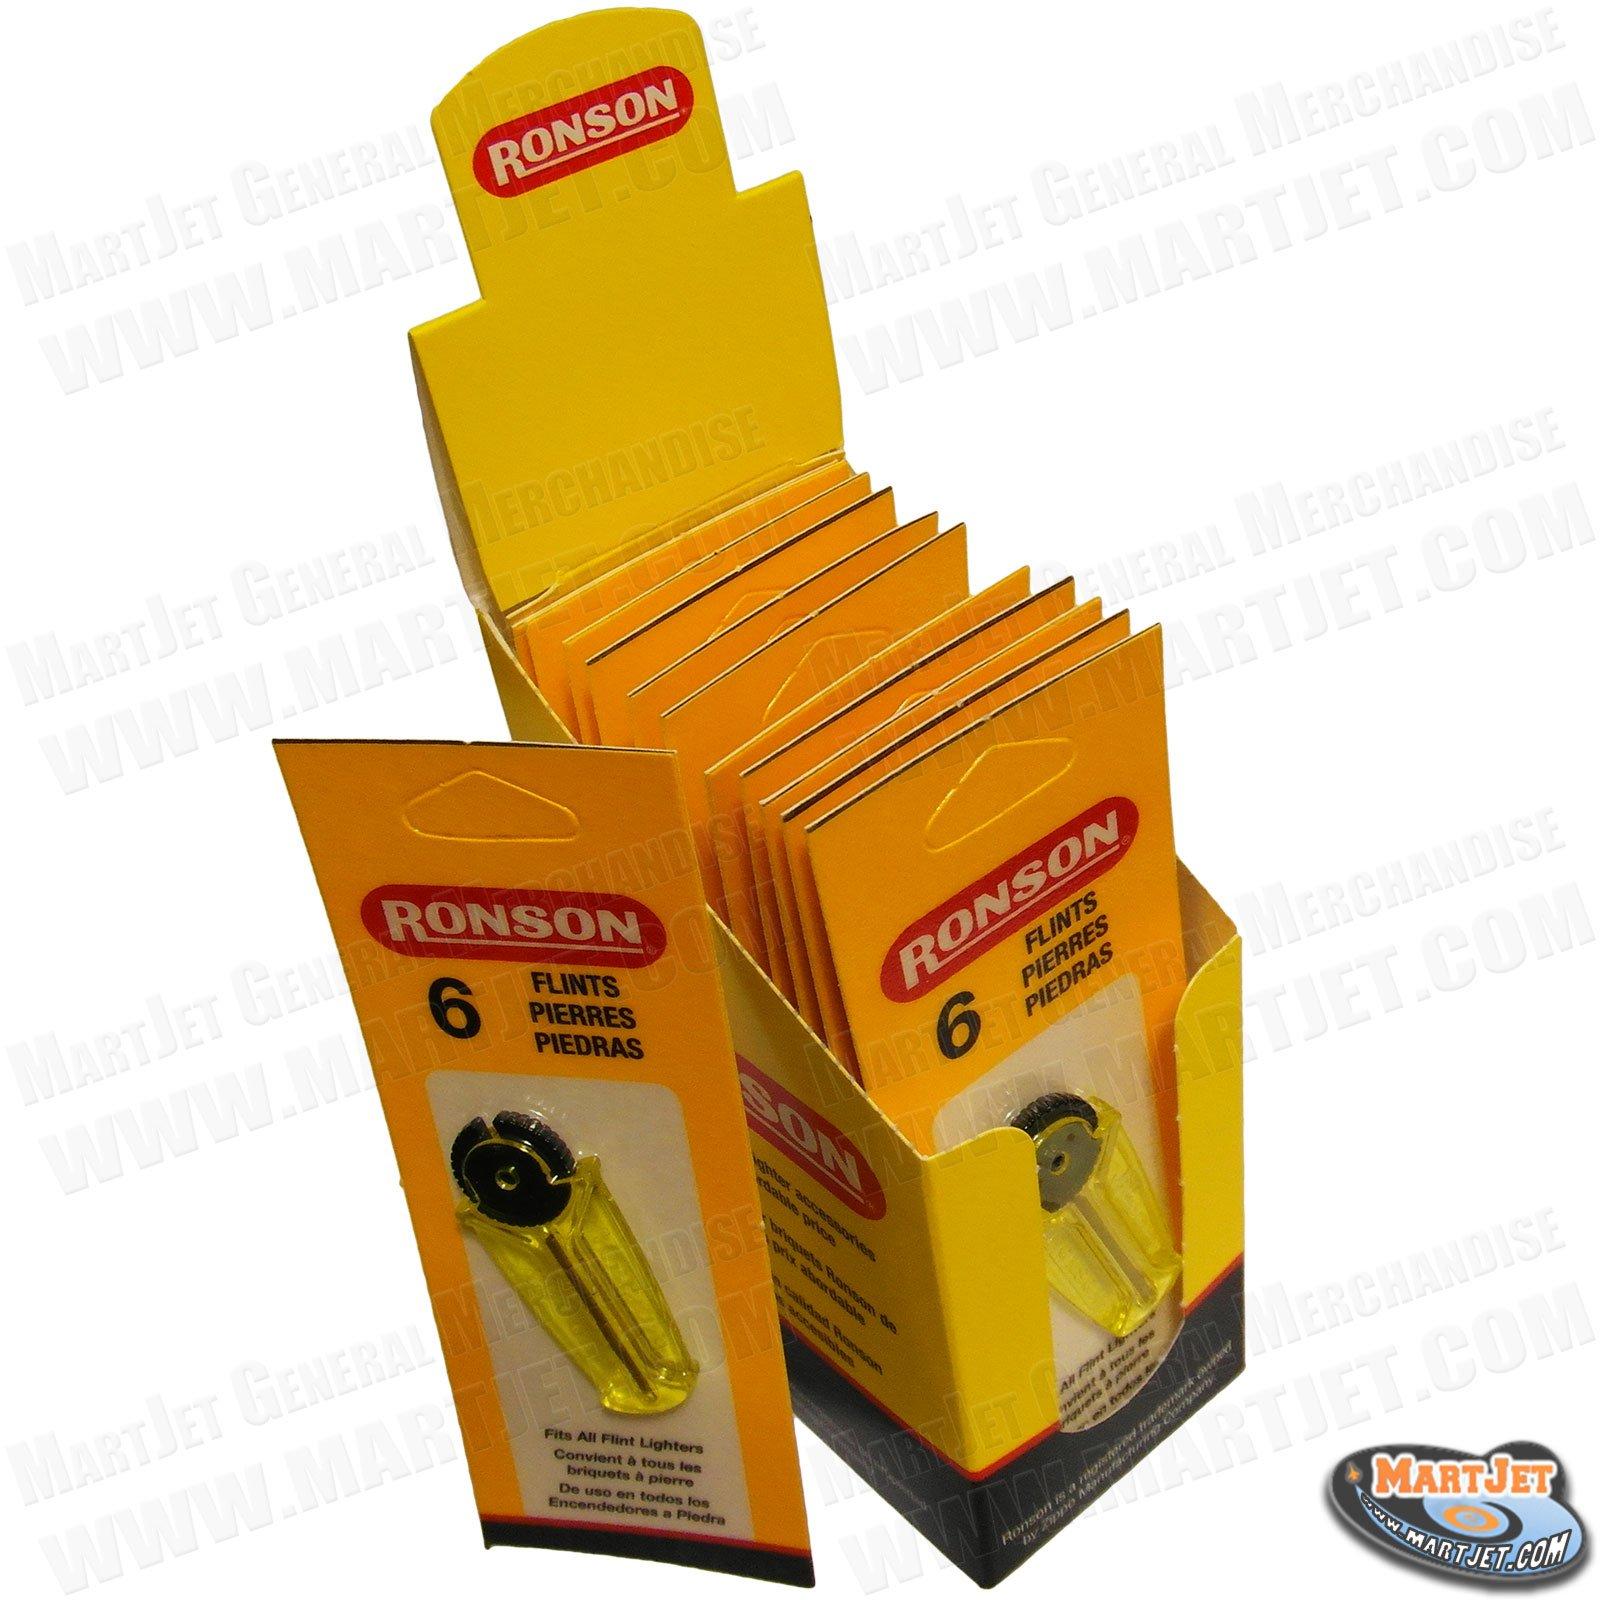 Ronson Flints Display Box (Spark Stones) for Lighters 12/6Pk (72 flints)